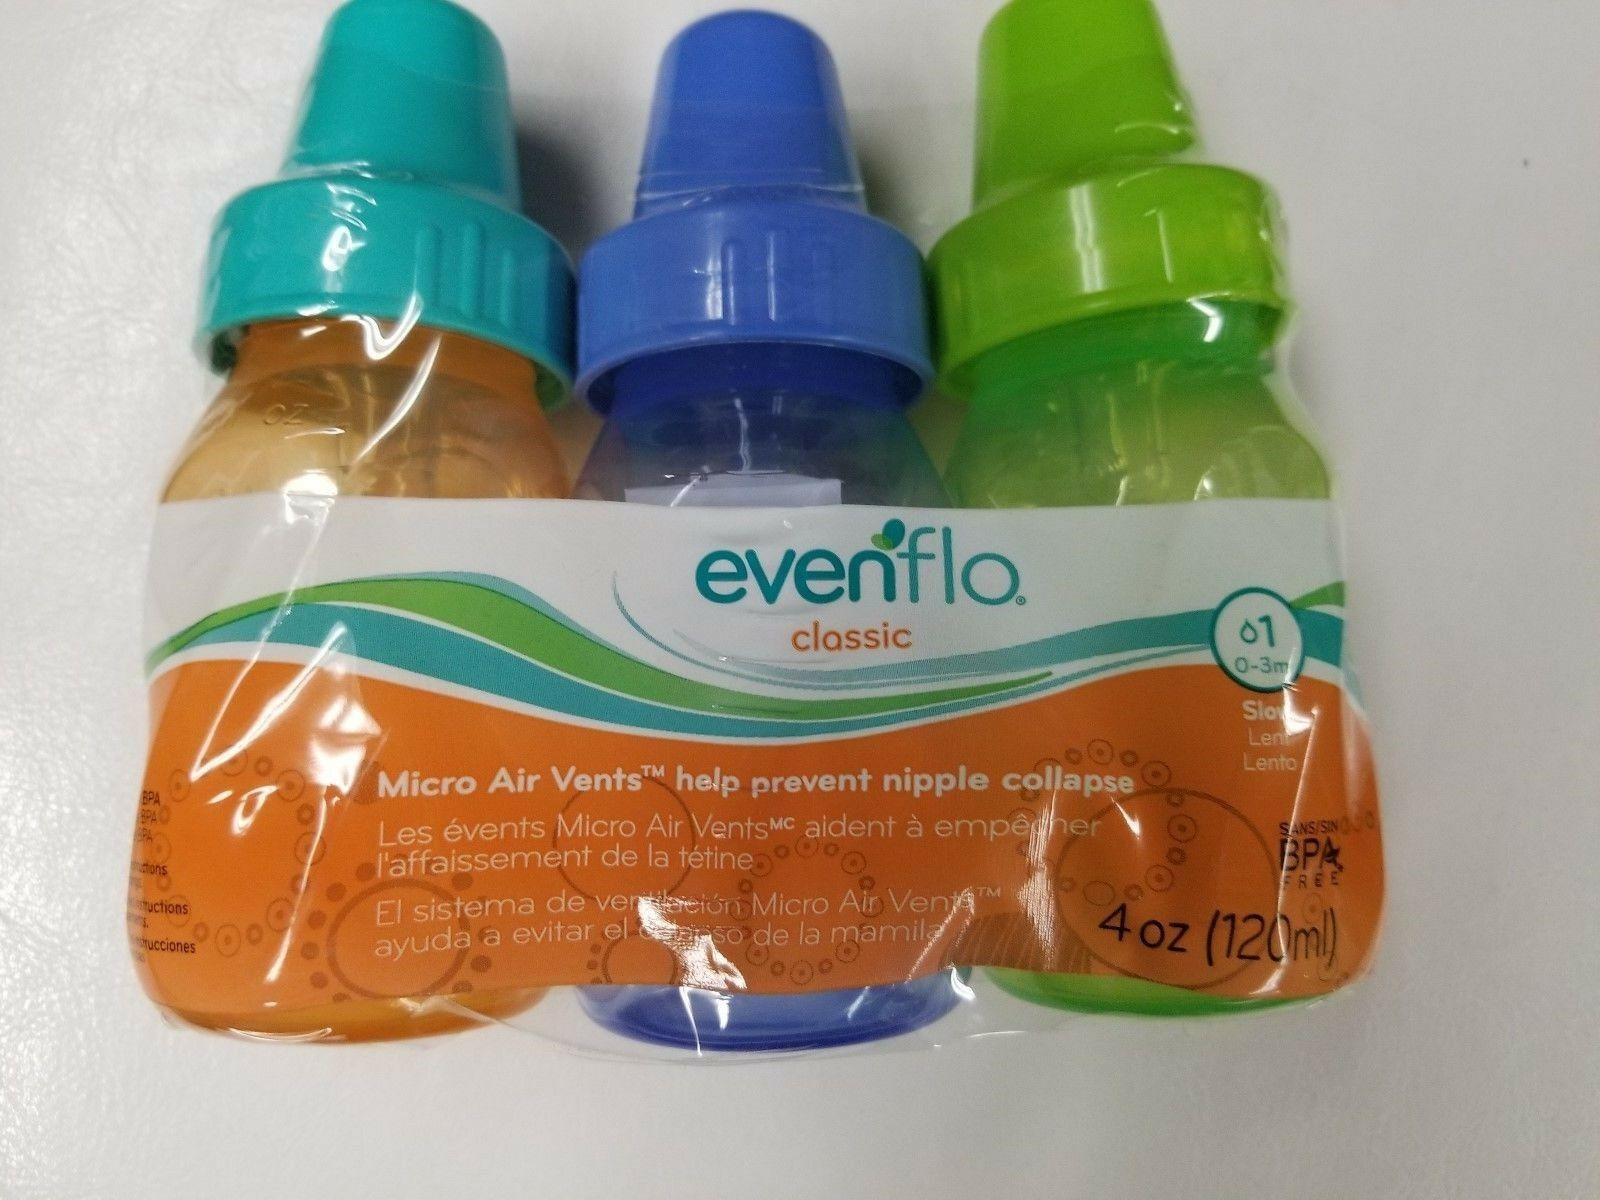 EvenFlo Classic Micro Air Vents 0-3m1 Slow Flow BPA Free 3 Pack 4 OZ Each - $9.49